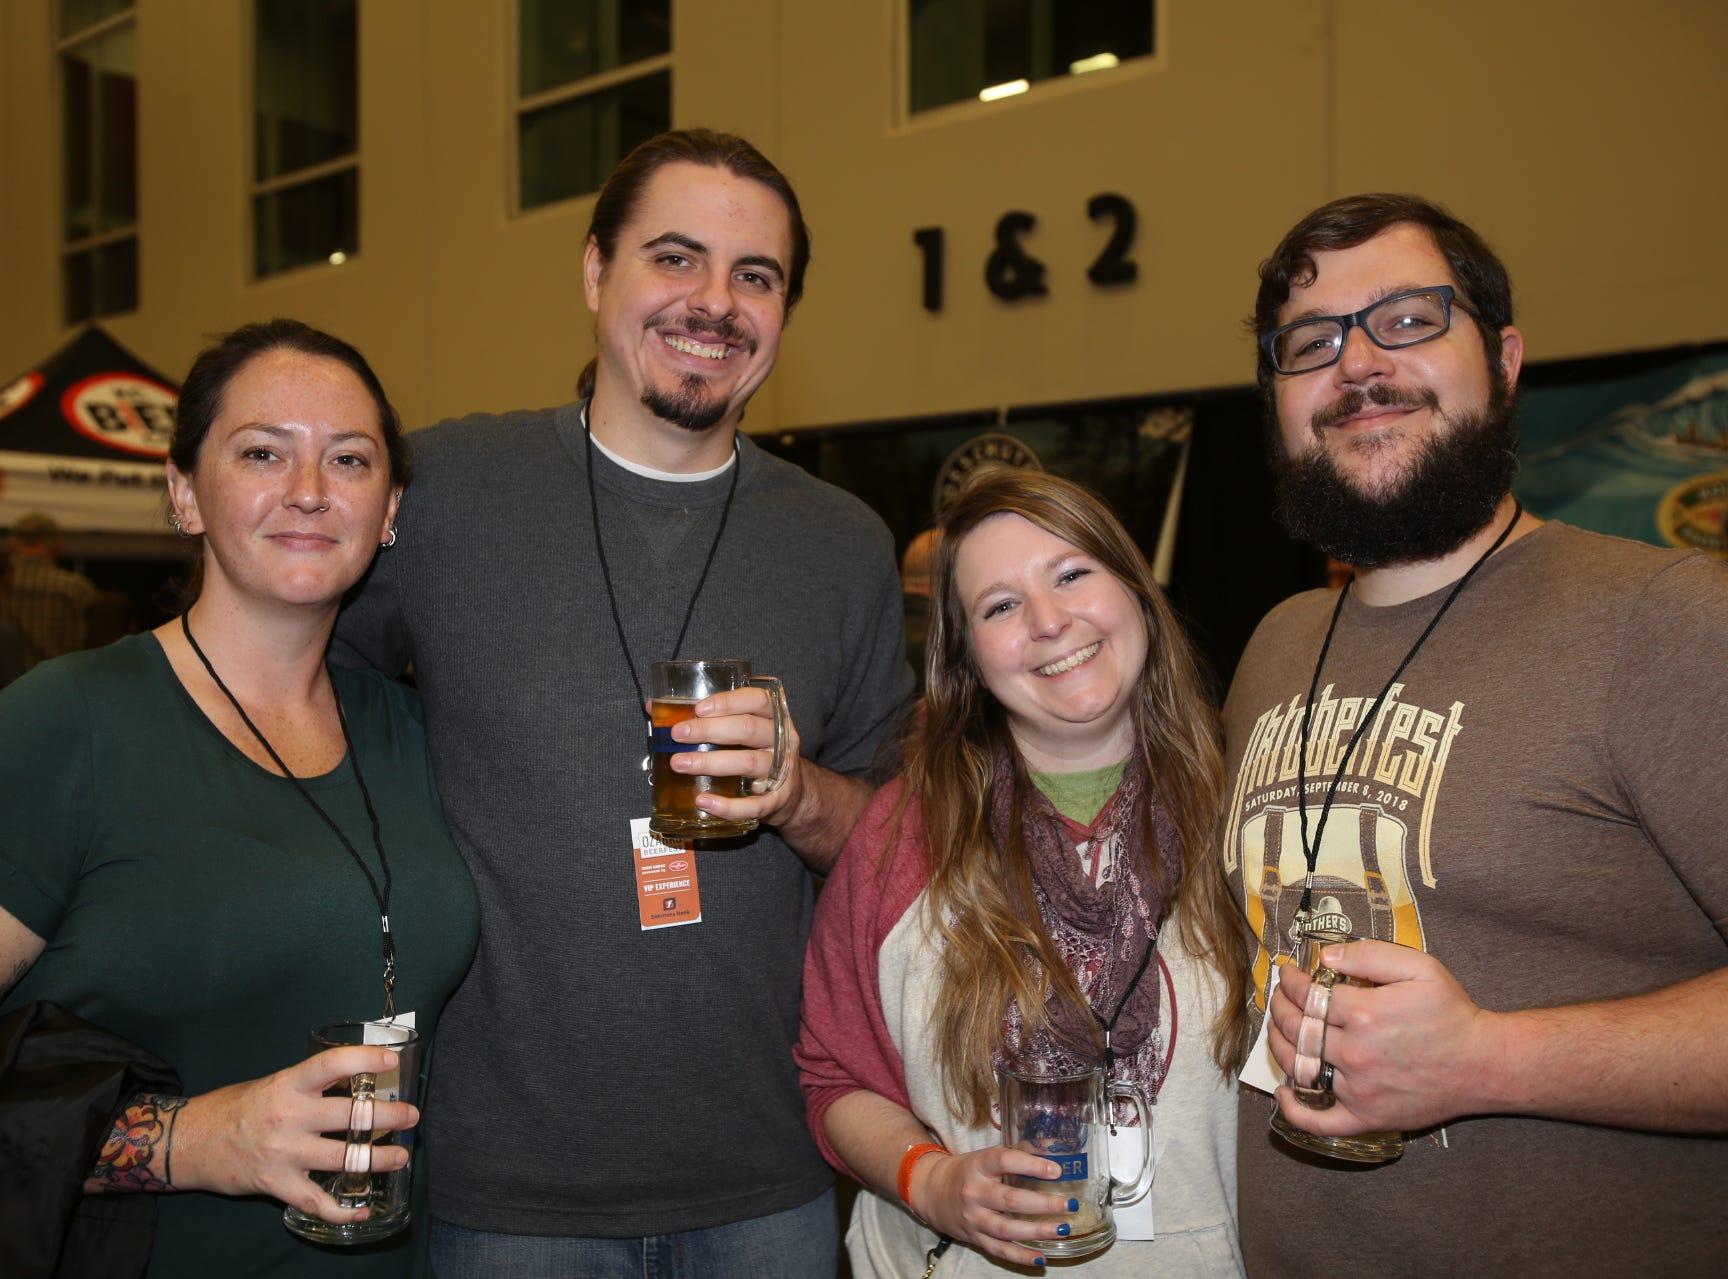 Kendle Durden, Alex Schenker, Jenny and Eric Alexander